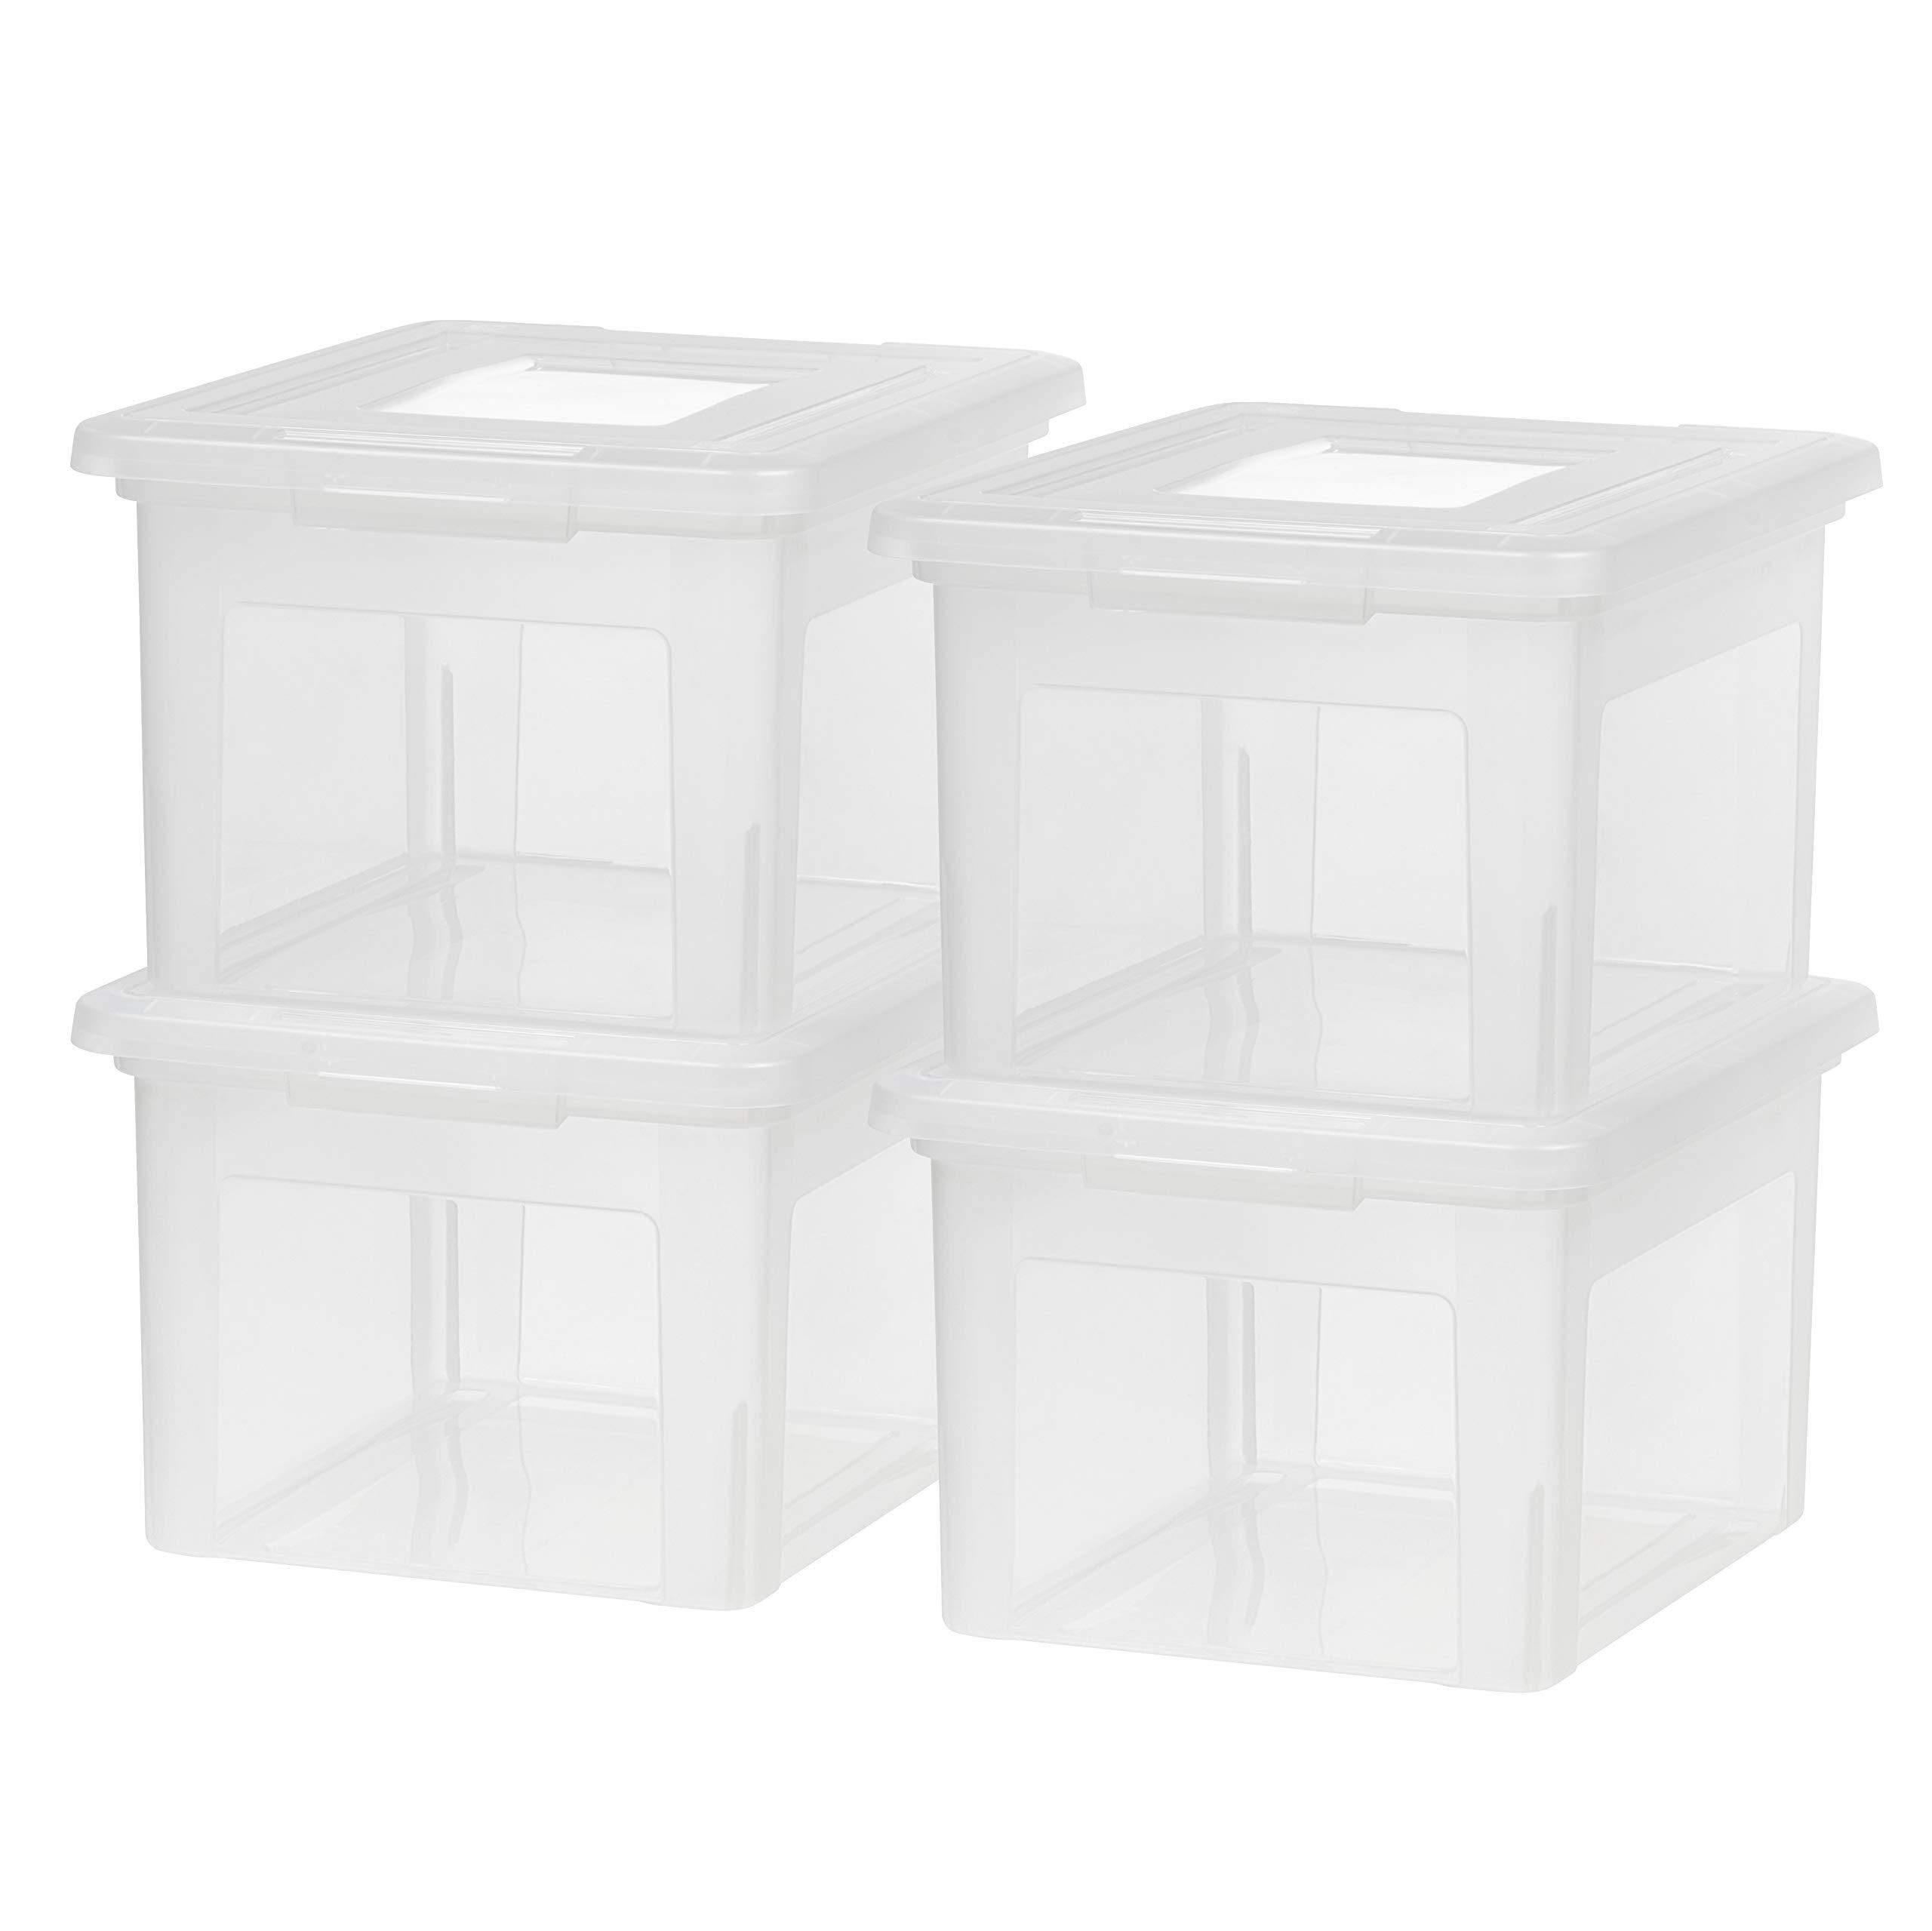 IRIS USA FB-21EE File Box, 35 QT, Clear, 4 Pack